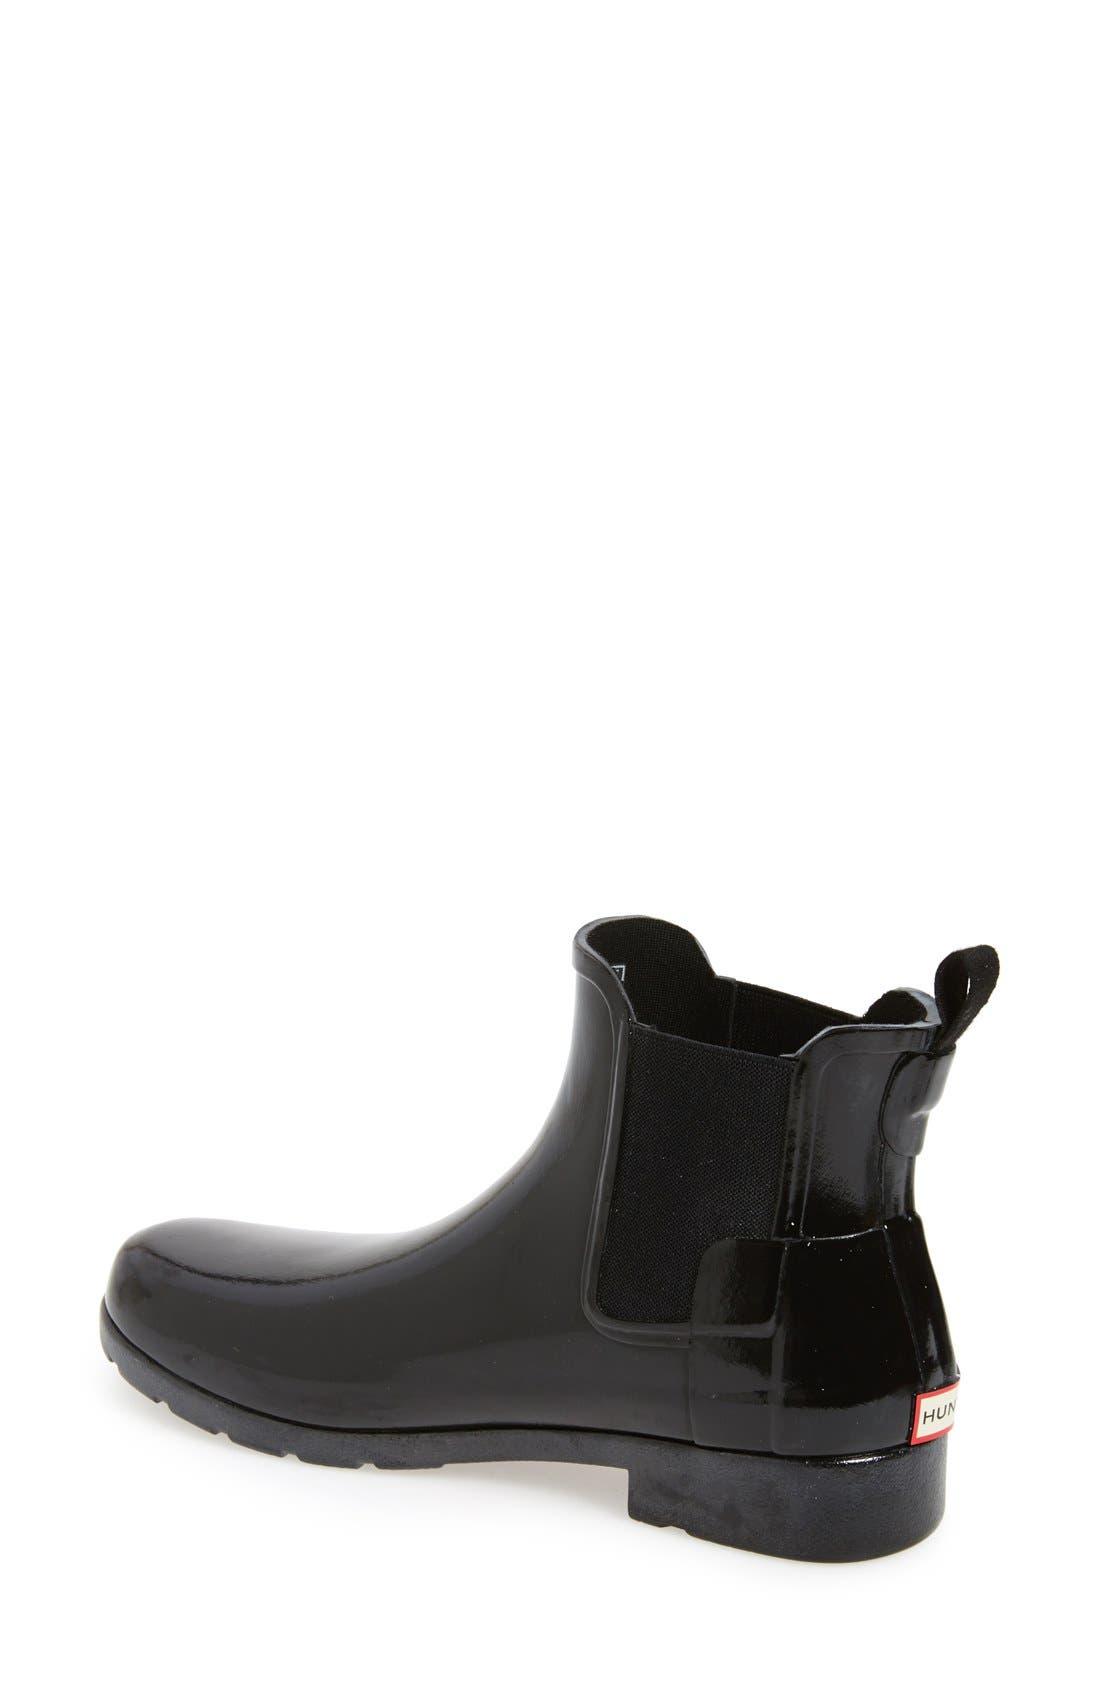 Alternate Image 2  - Hunter 'Original Refined' Chelsea Rain Boot (Women)